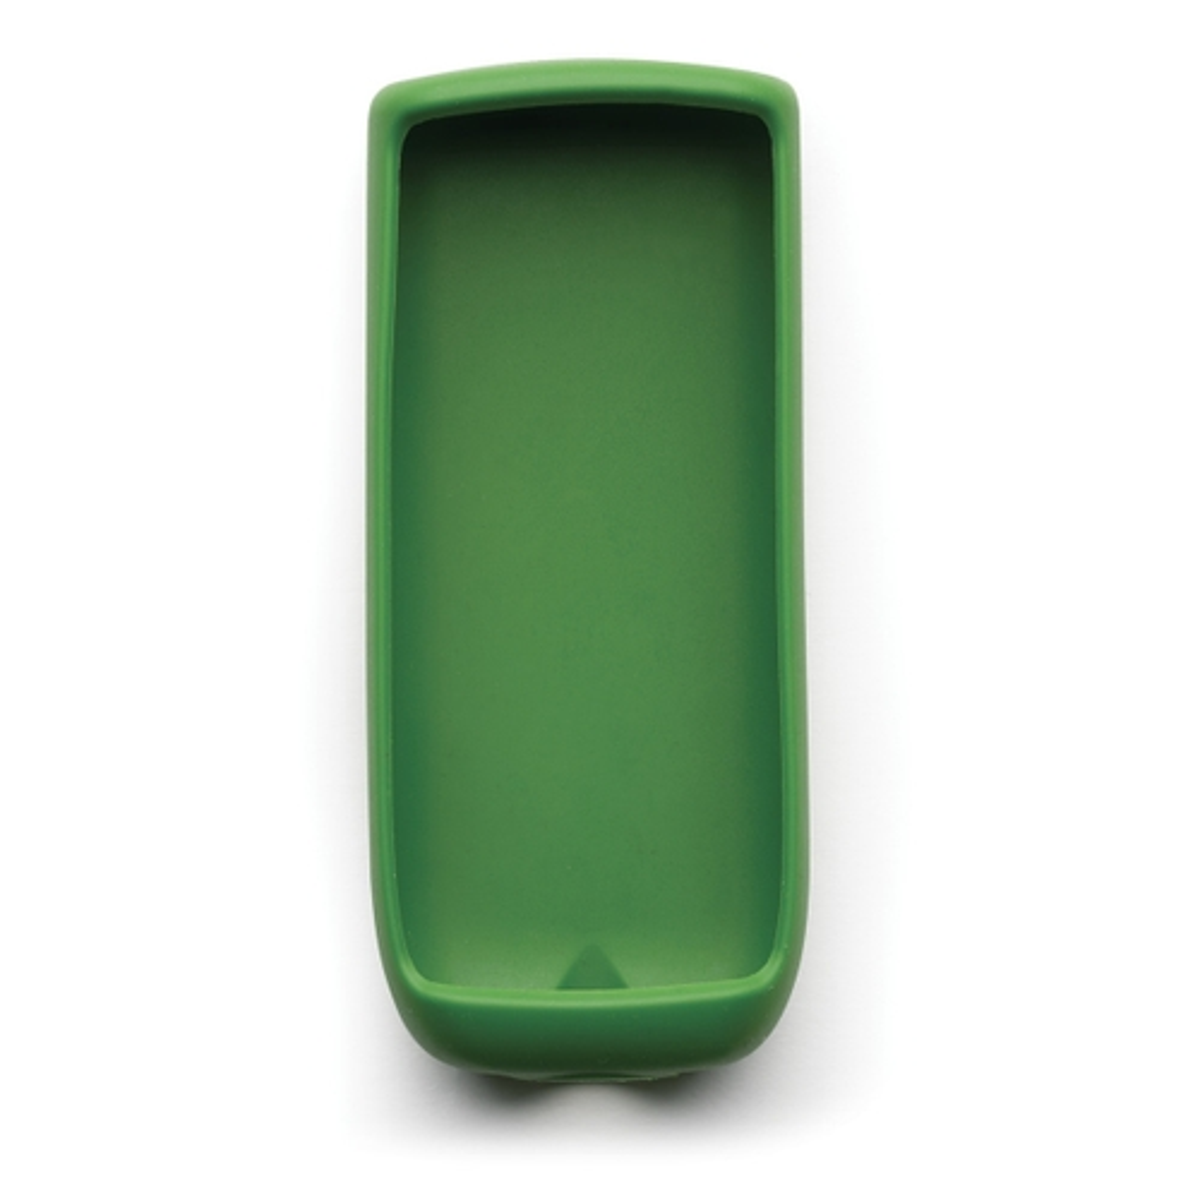 Shockproof Rubber Boot (Green) - HI710030